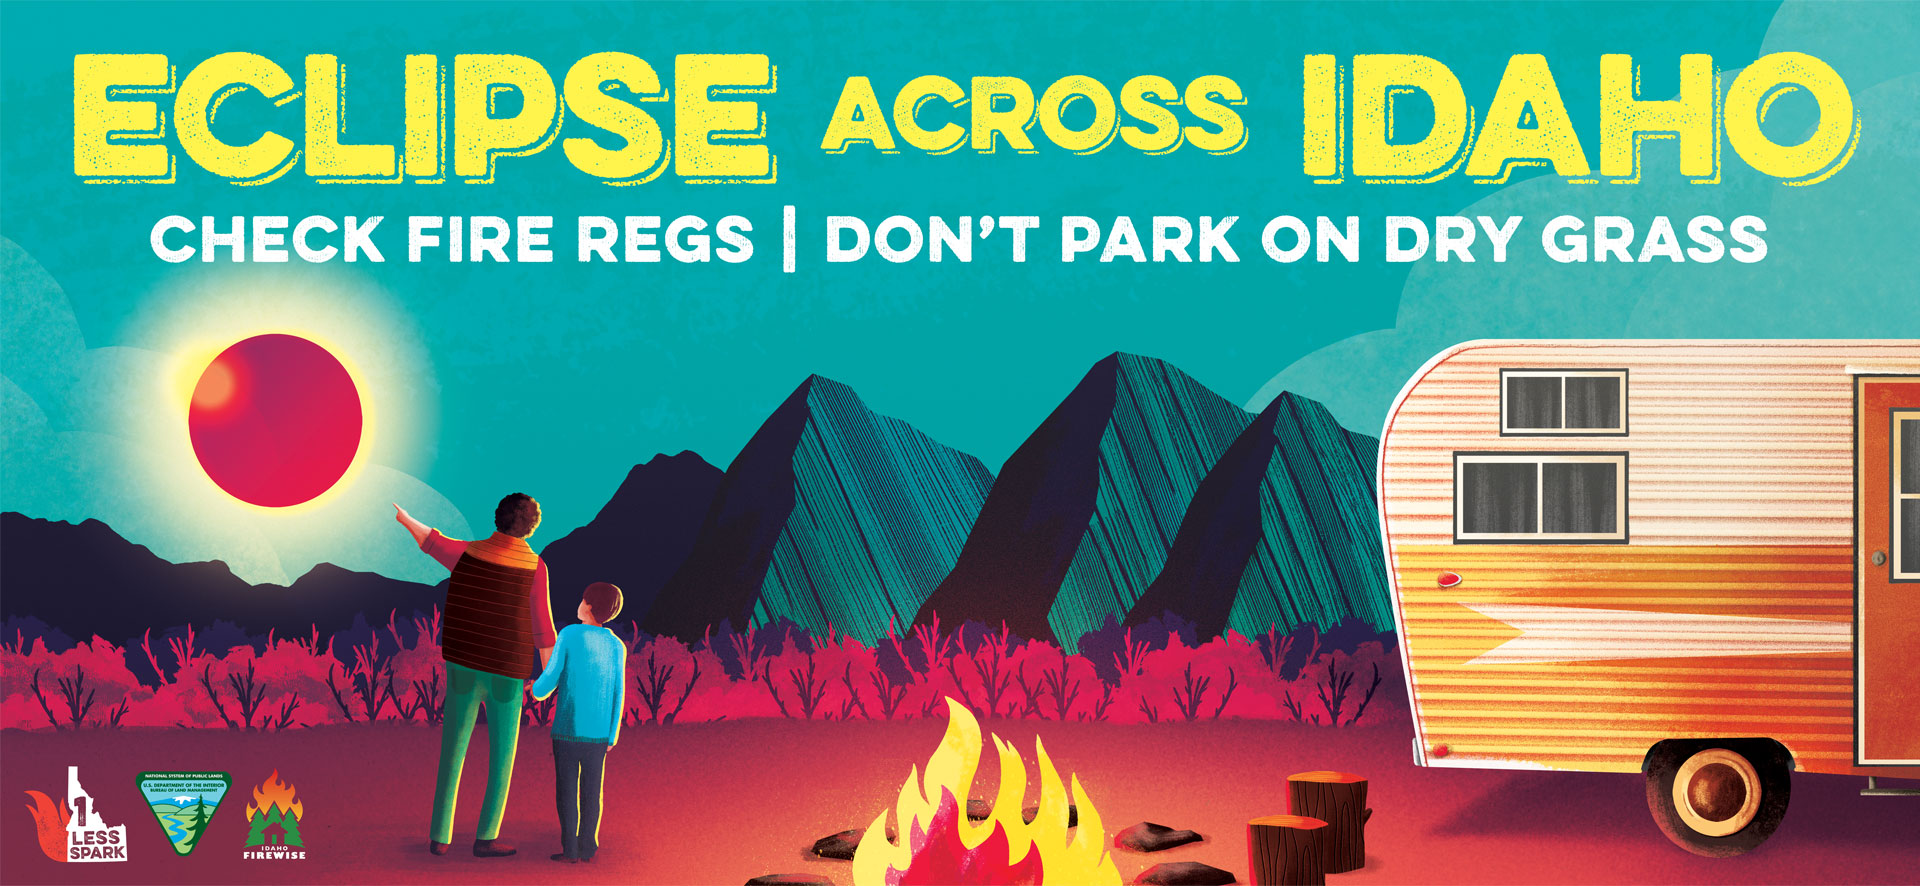 Idaho Firewise & BLM Eclipse billboard